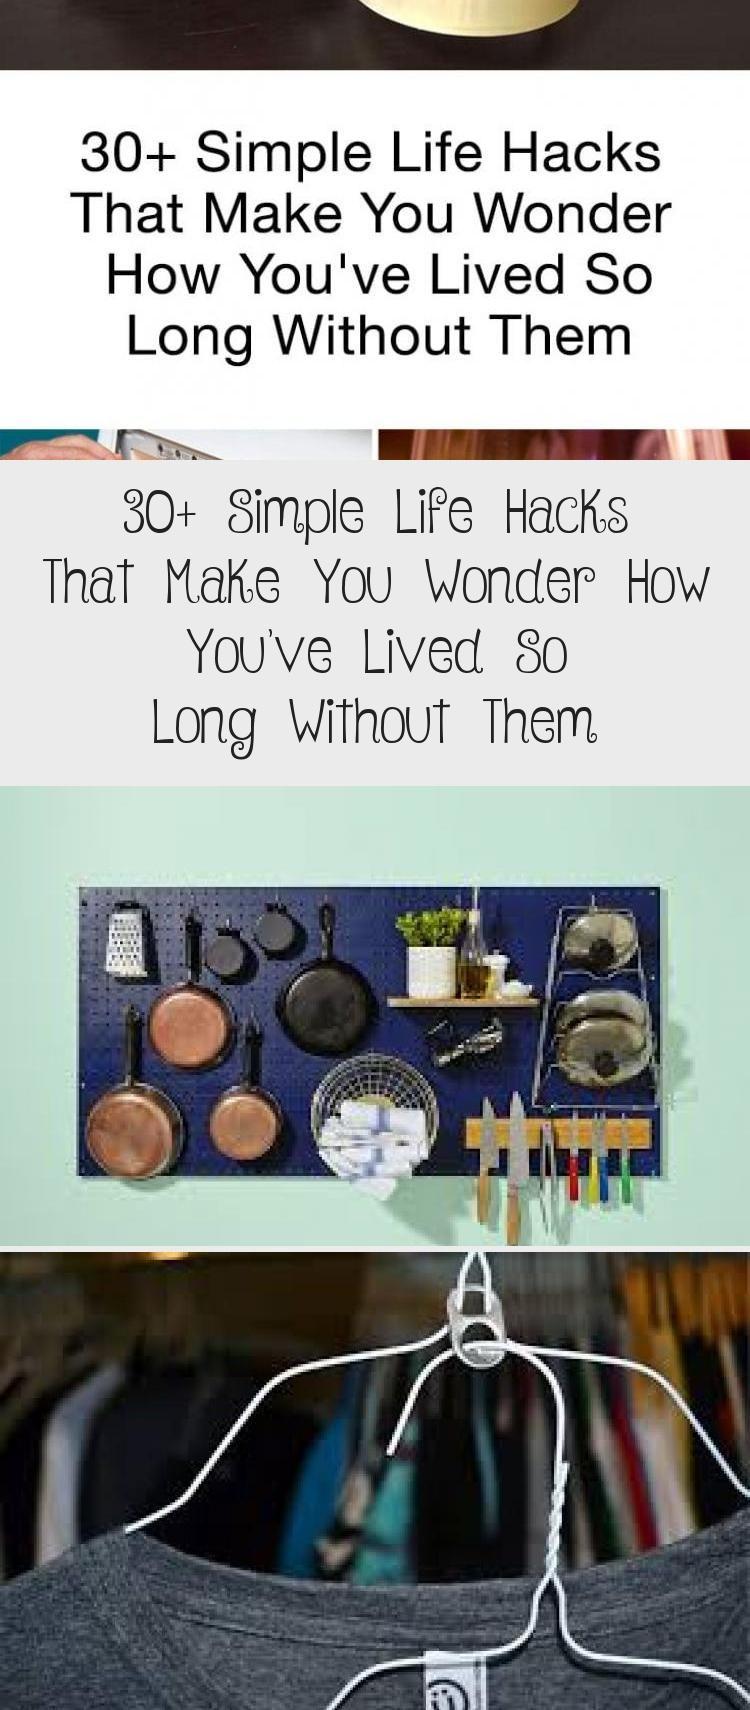 30+ Simple Life Hacks That Make You Wonder How You've